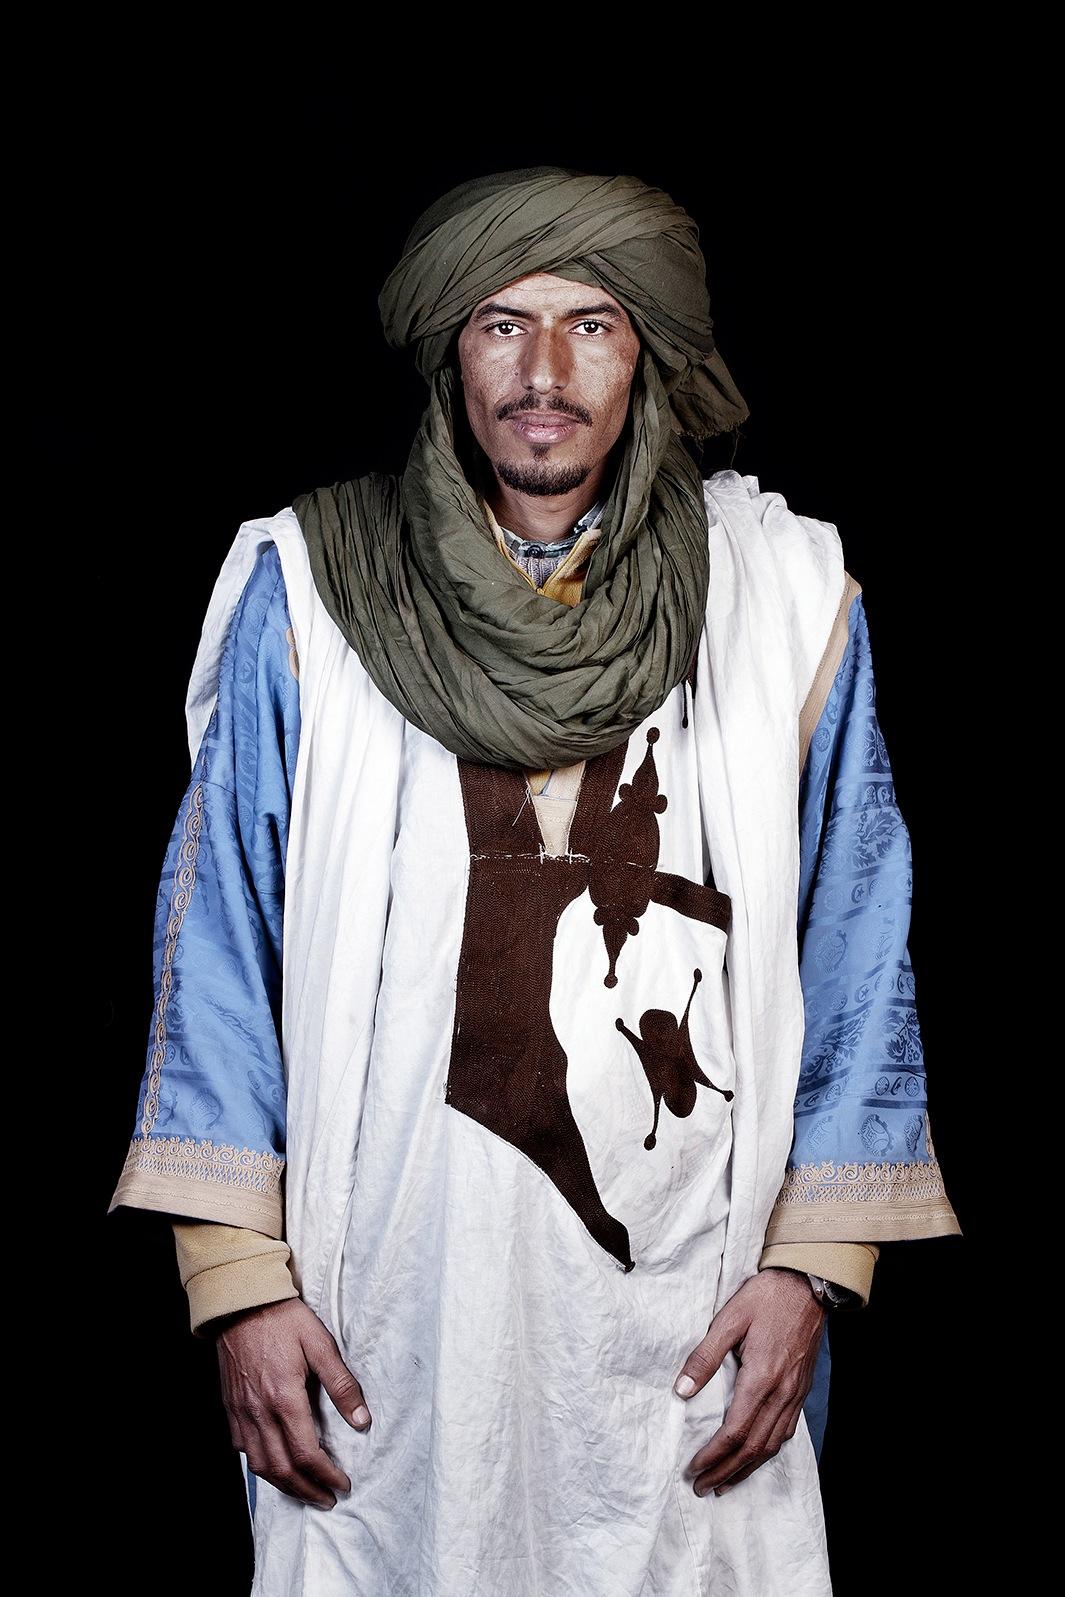 Марокканцы - портреты от Лейлы Алауи-09